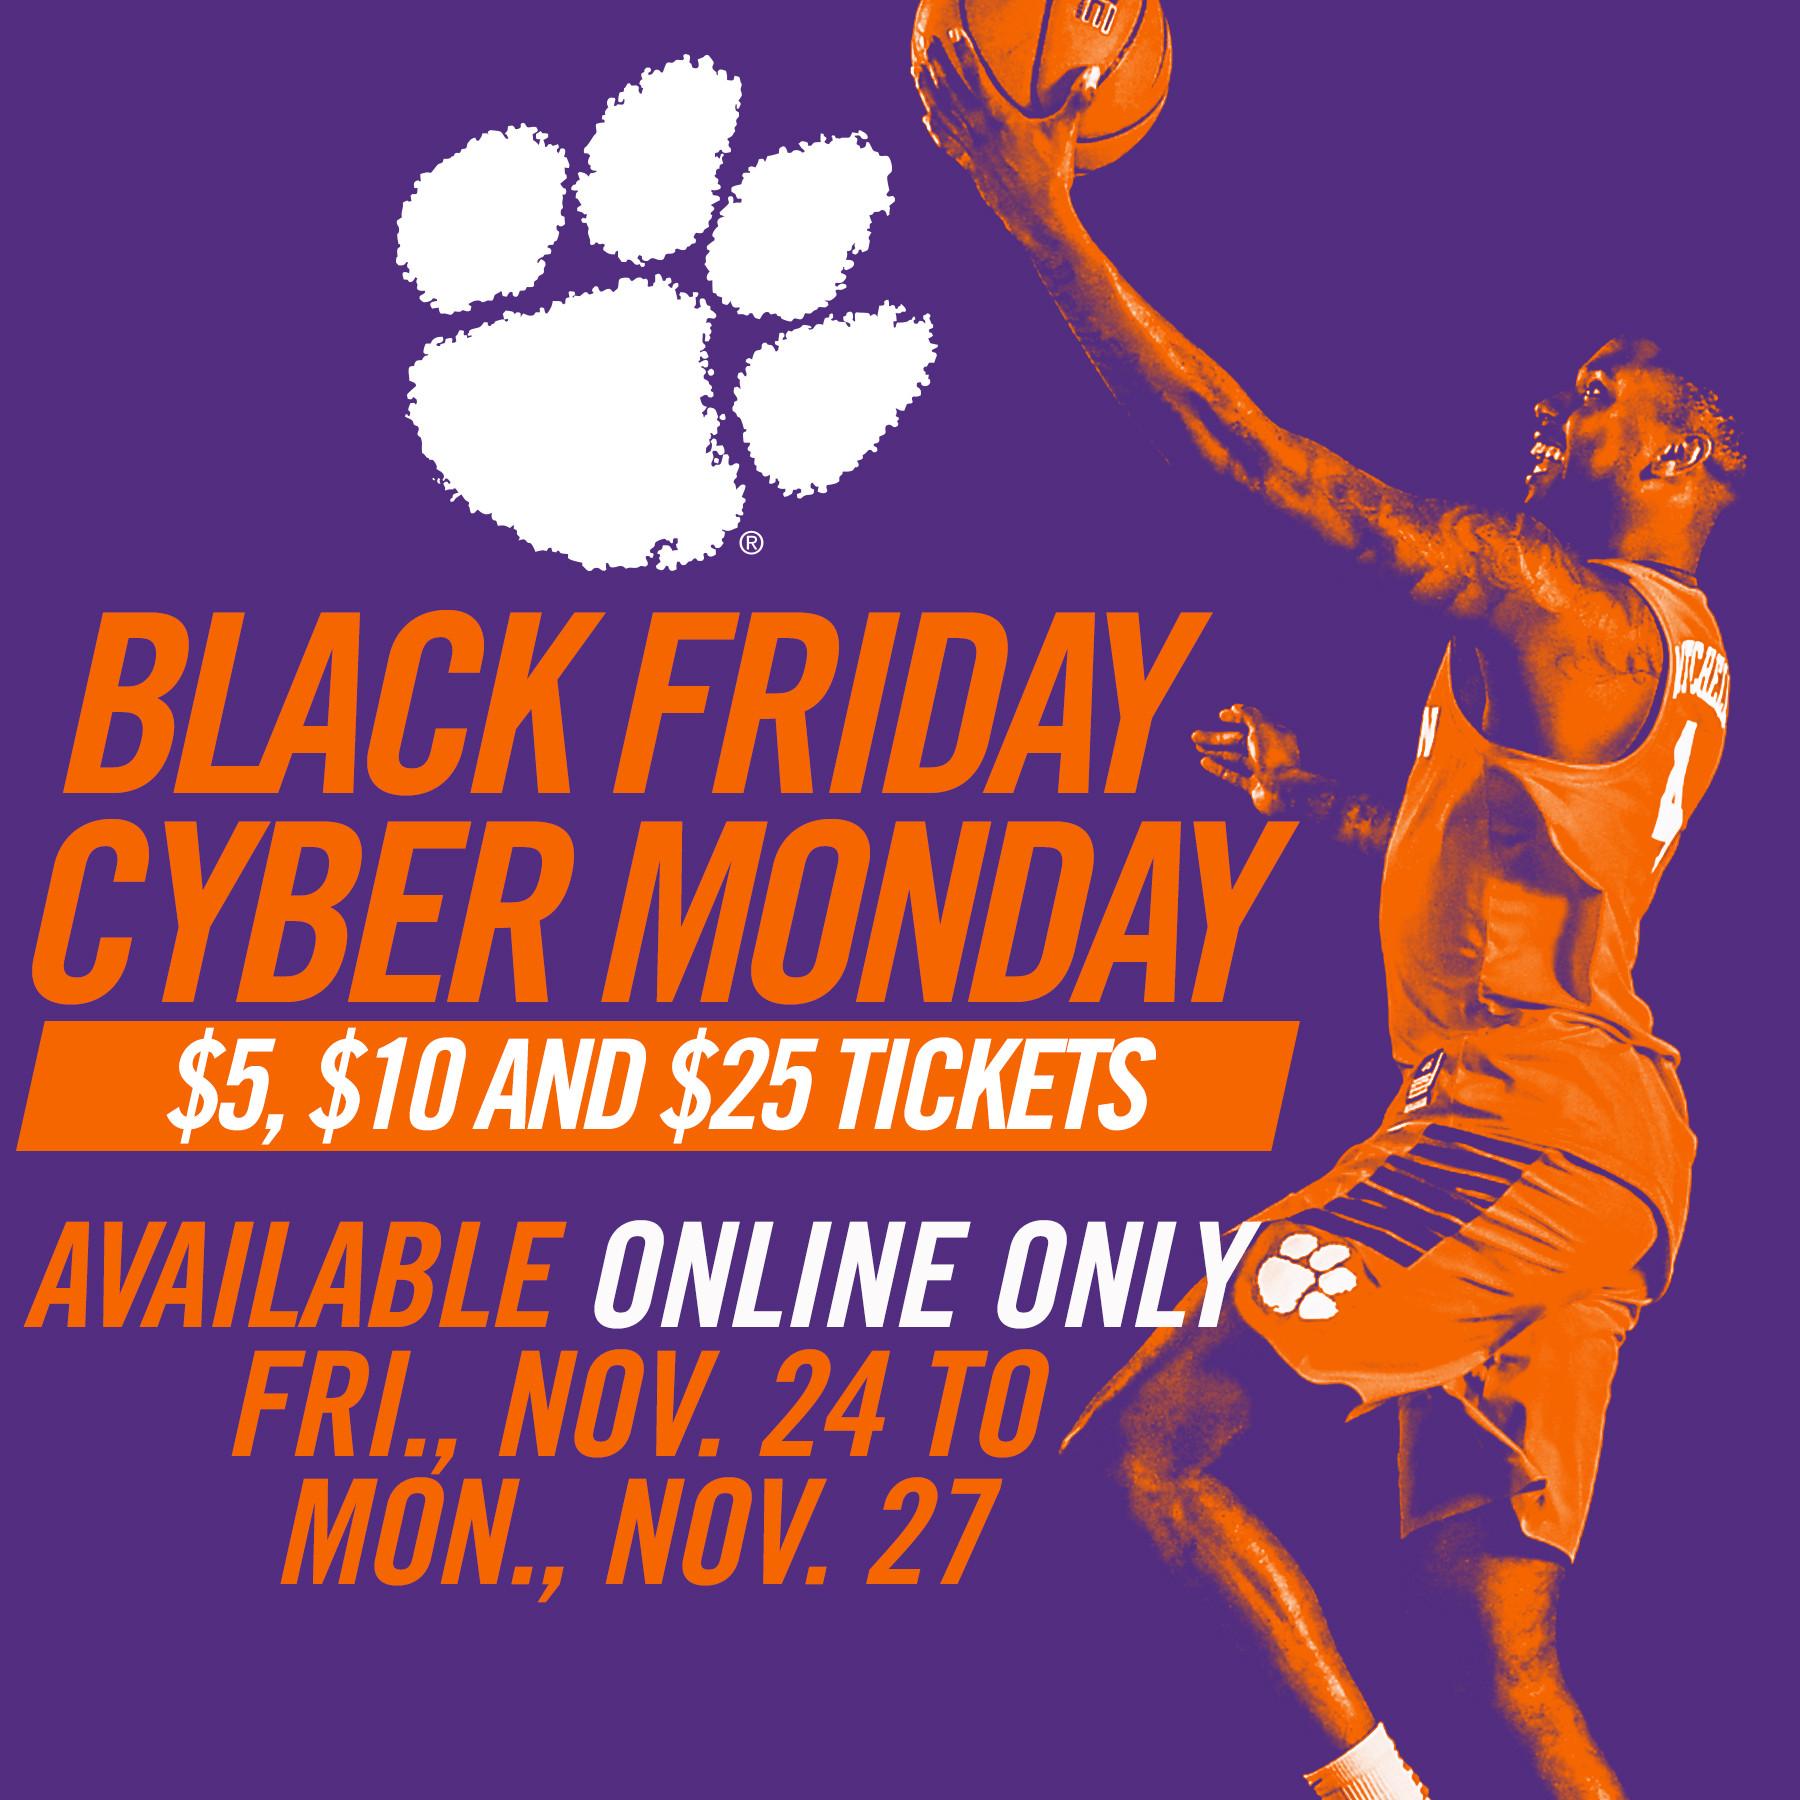 MBB Black Friday/Cyber Monday Deals